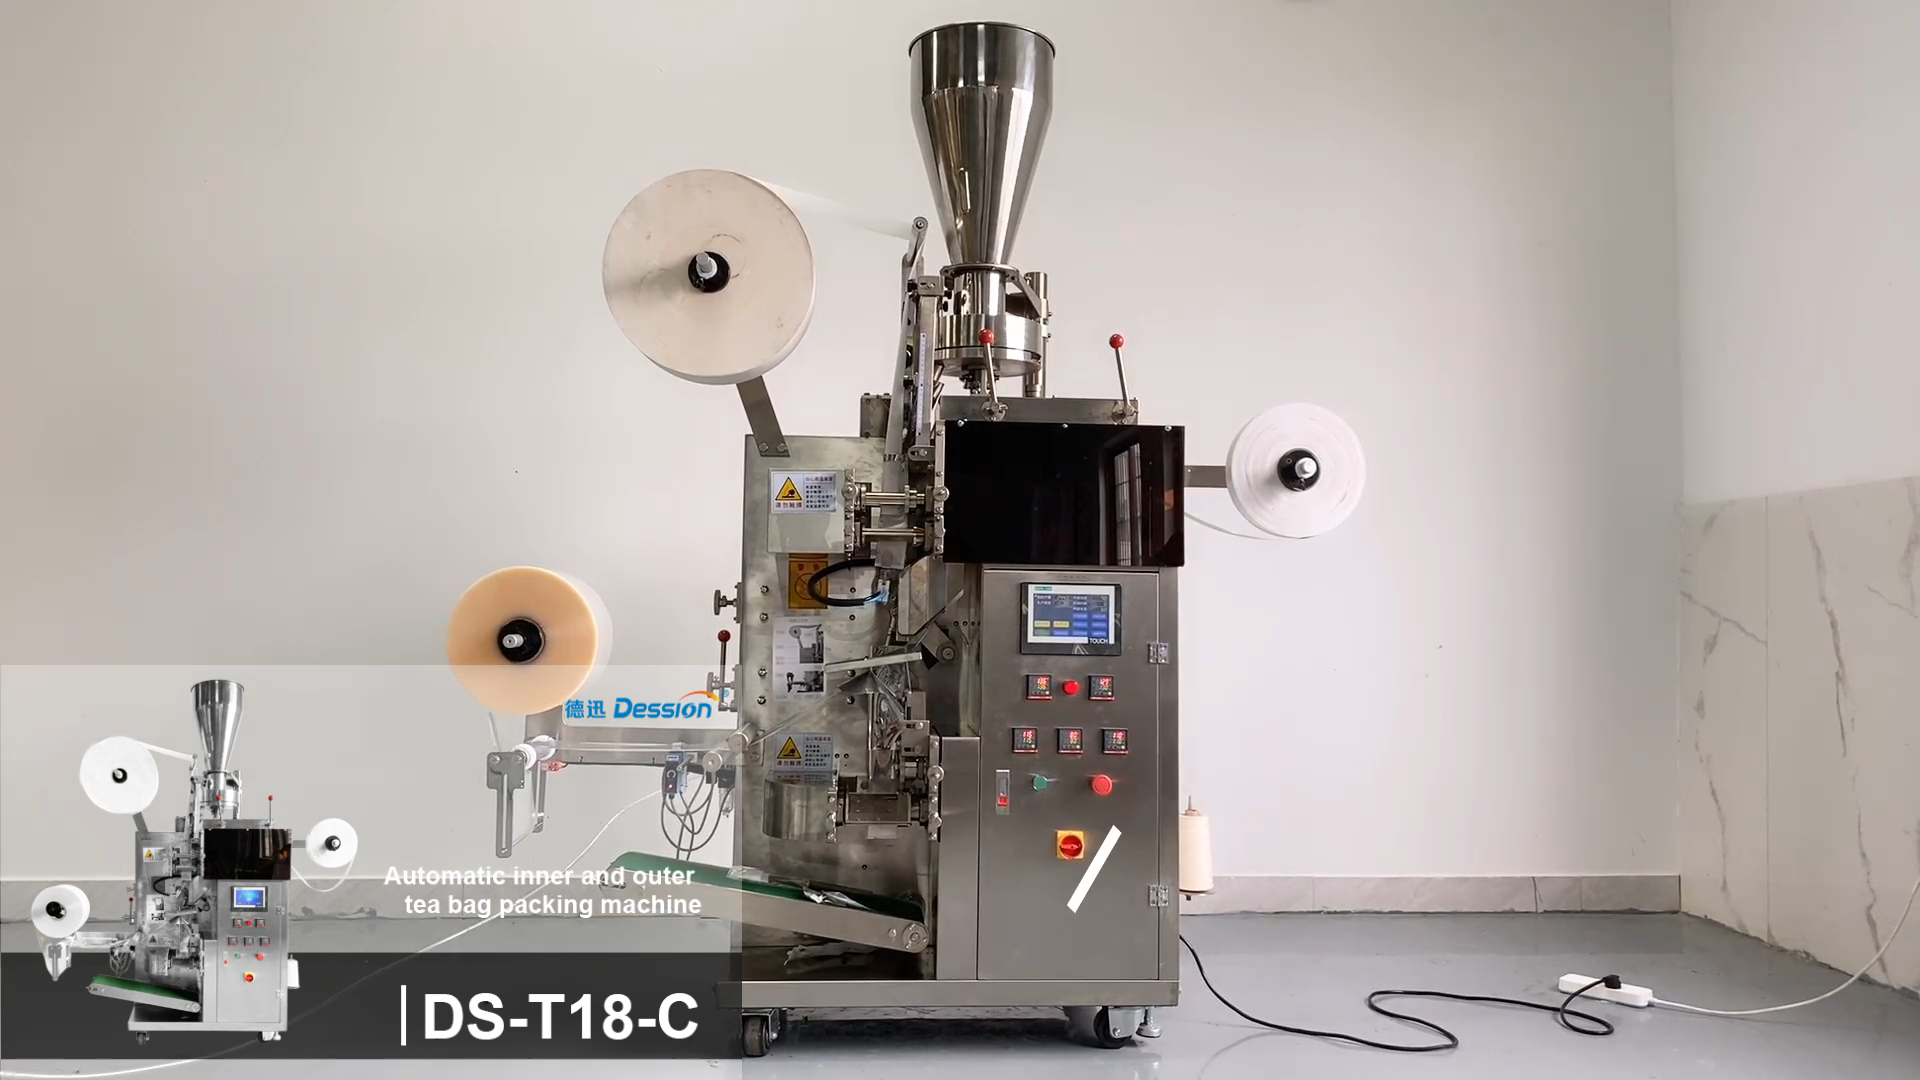 Kecepatan Tinggi Double Chamber Filter Dip Kantong Teh Kemasan Mesin dengan Tali dan Tag Otomatis Kantong Teh Kemasan Mesin